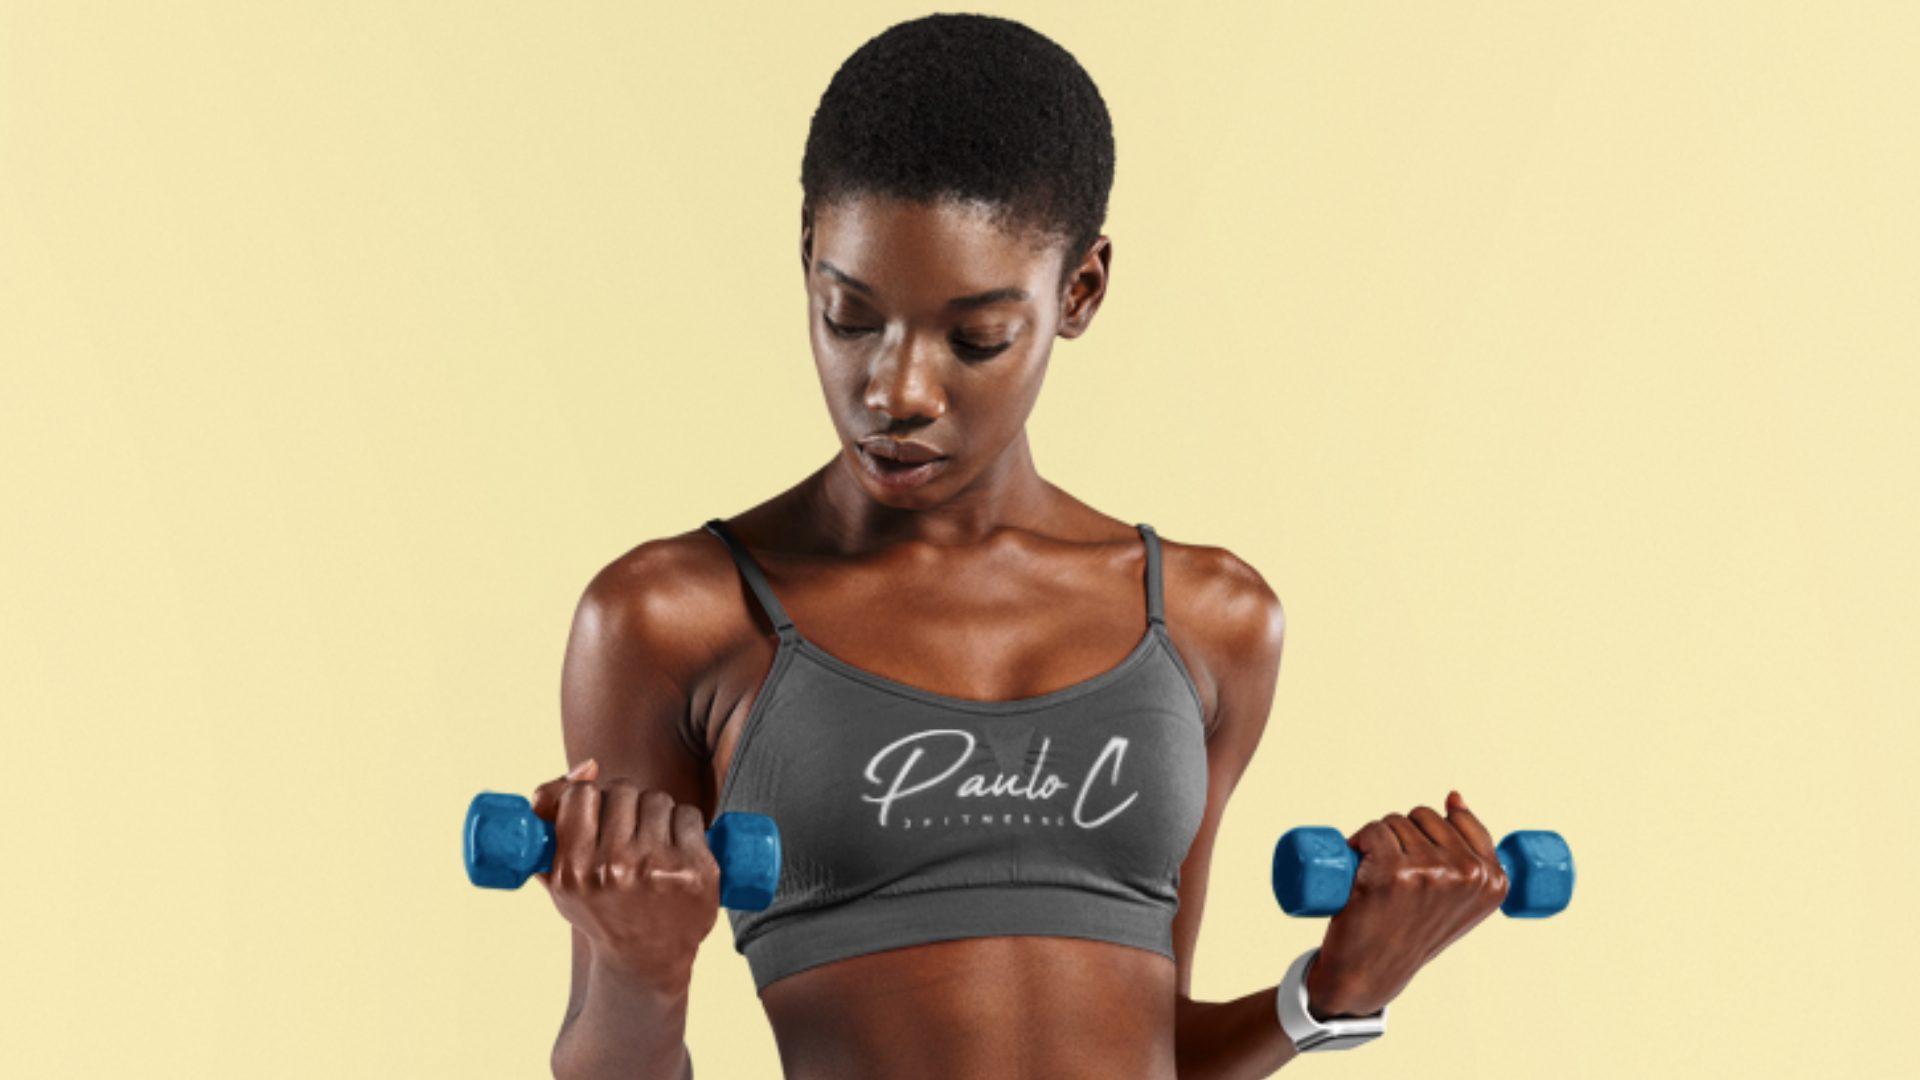 Paulo C Fitness - Logo Mockup 01